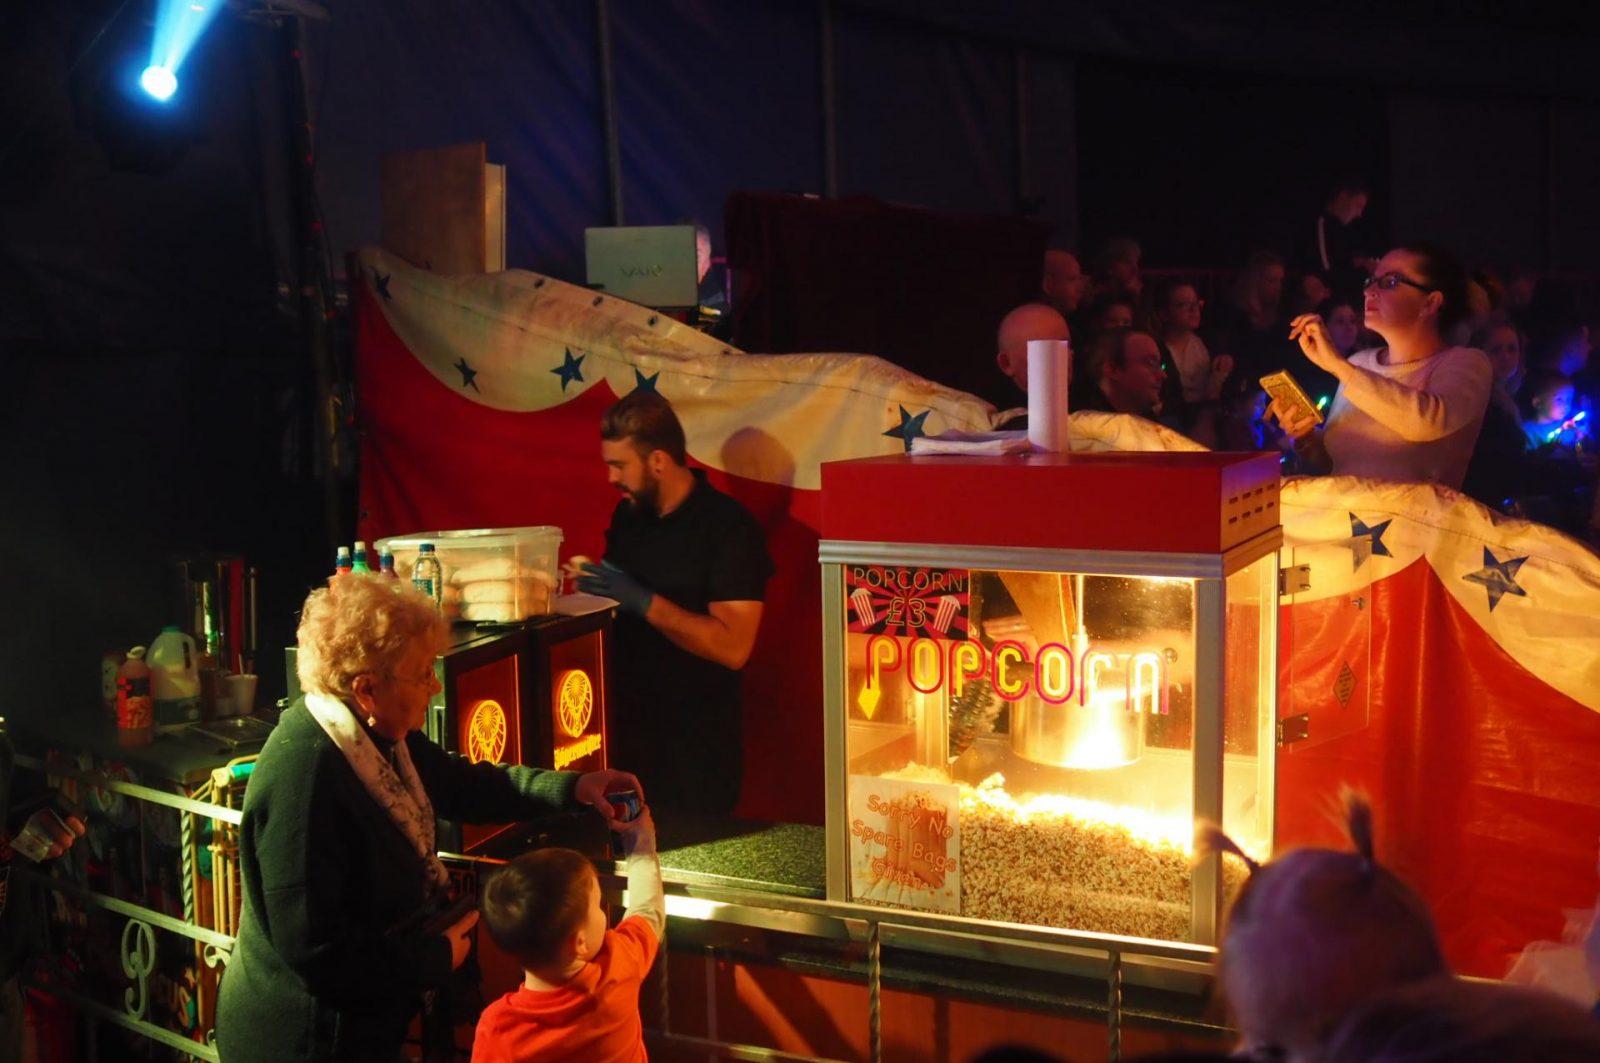 The Paulos Circus popcorn